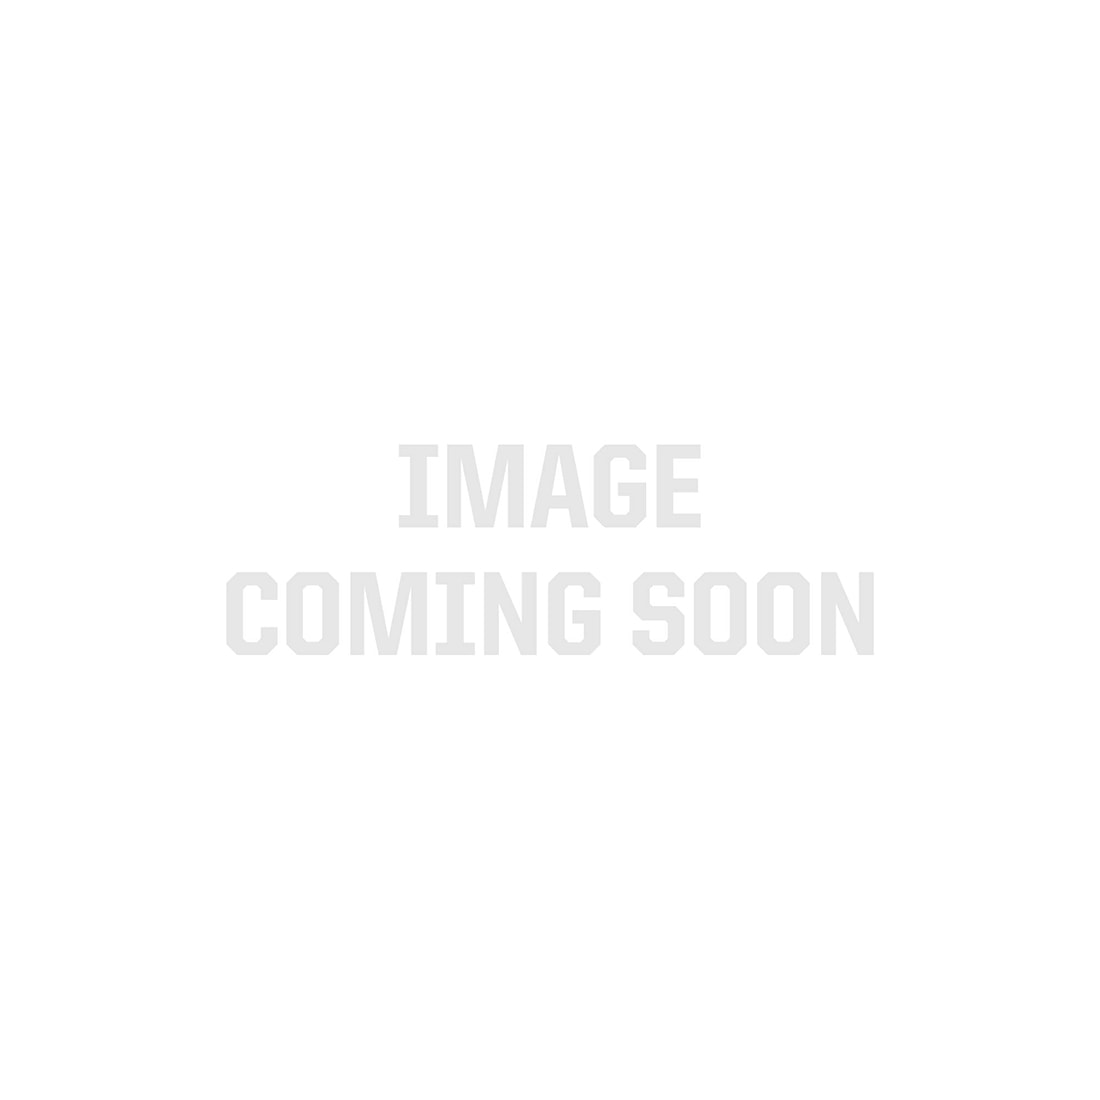 TruColor 2835 LED Strip Light - 5,000K - 80/m - CurrentControl - Sample Kit